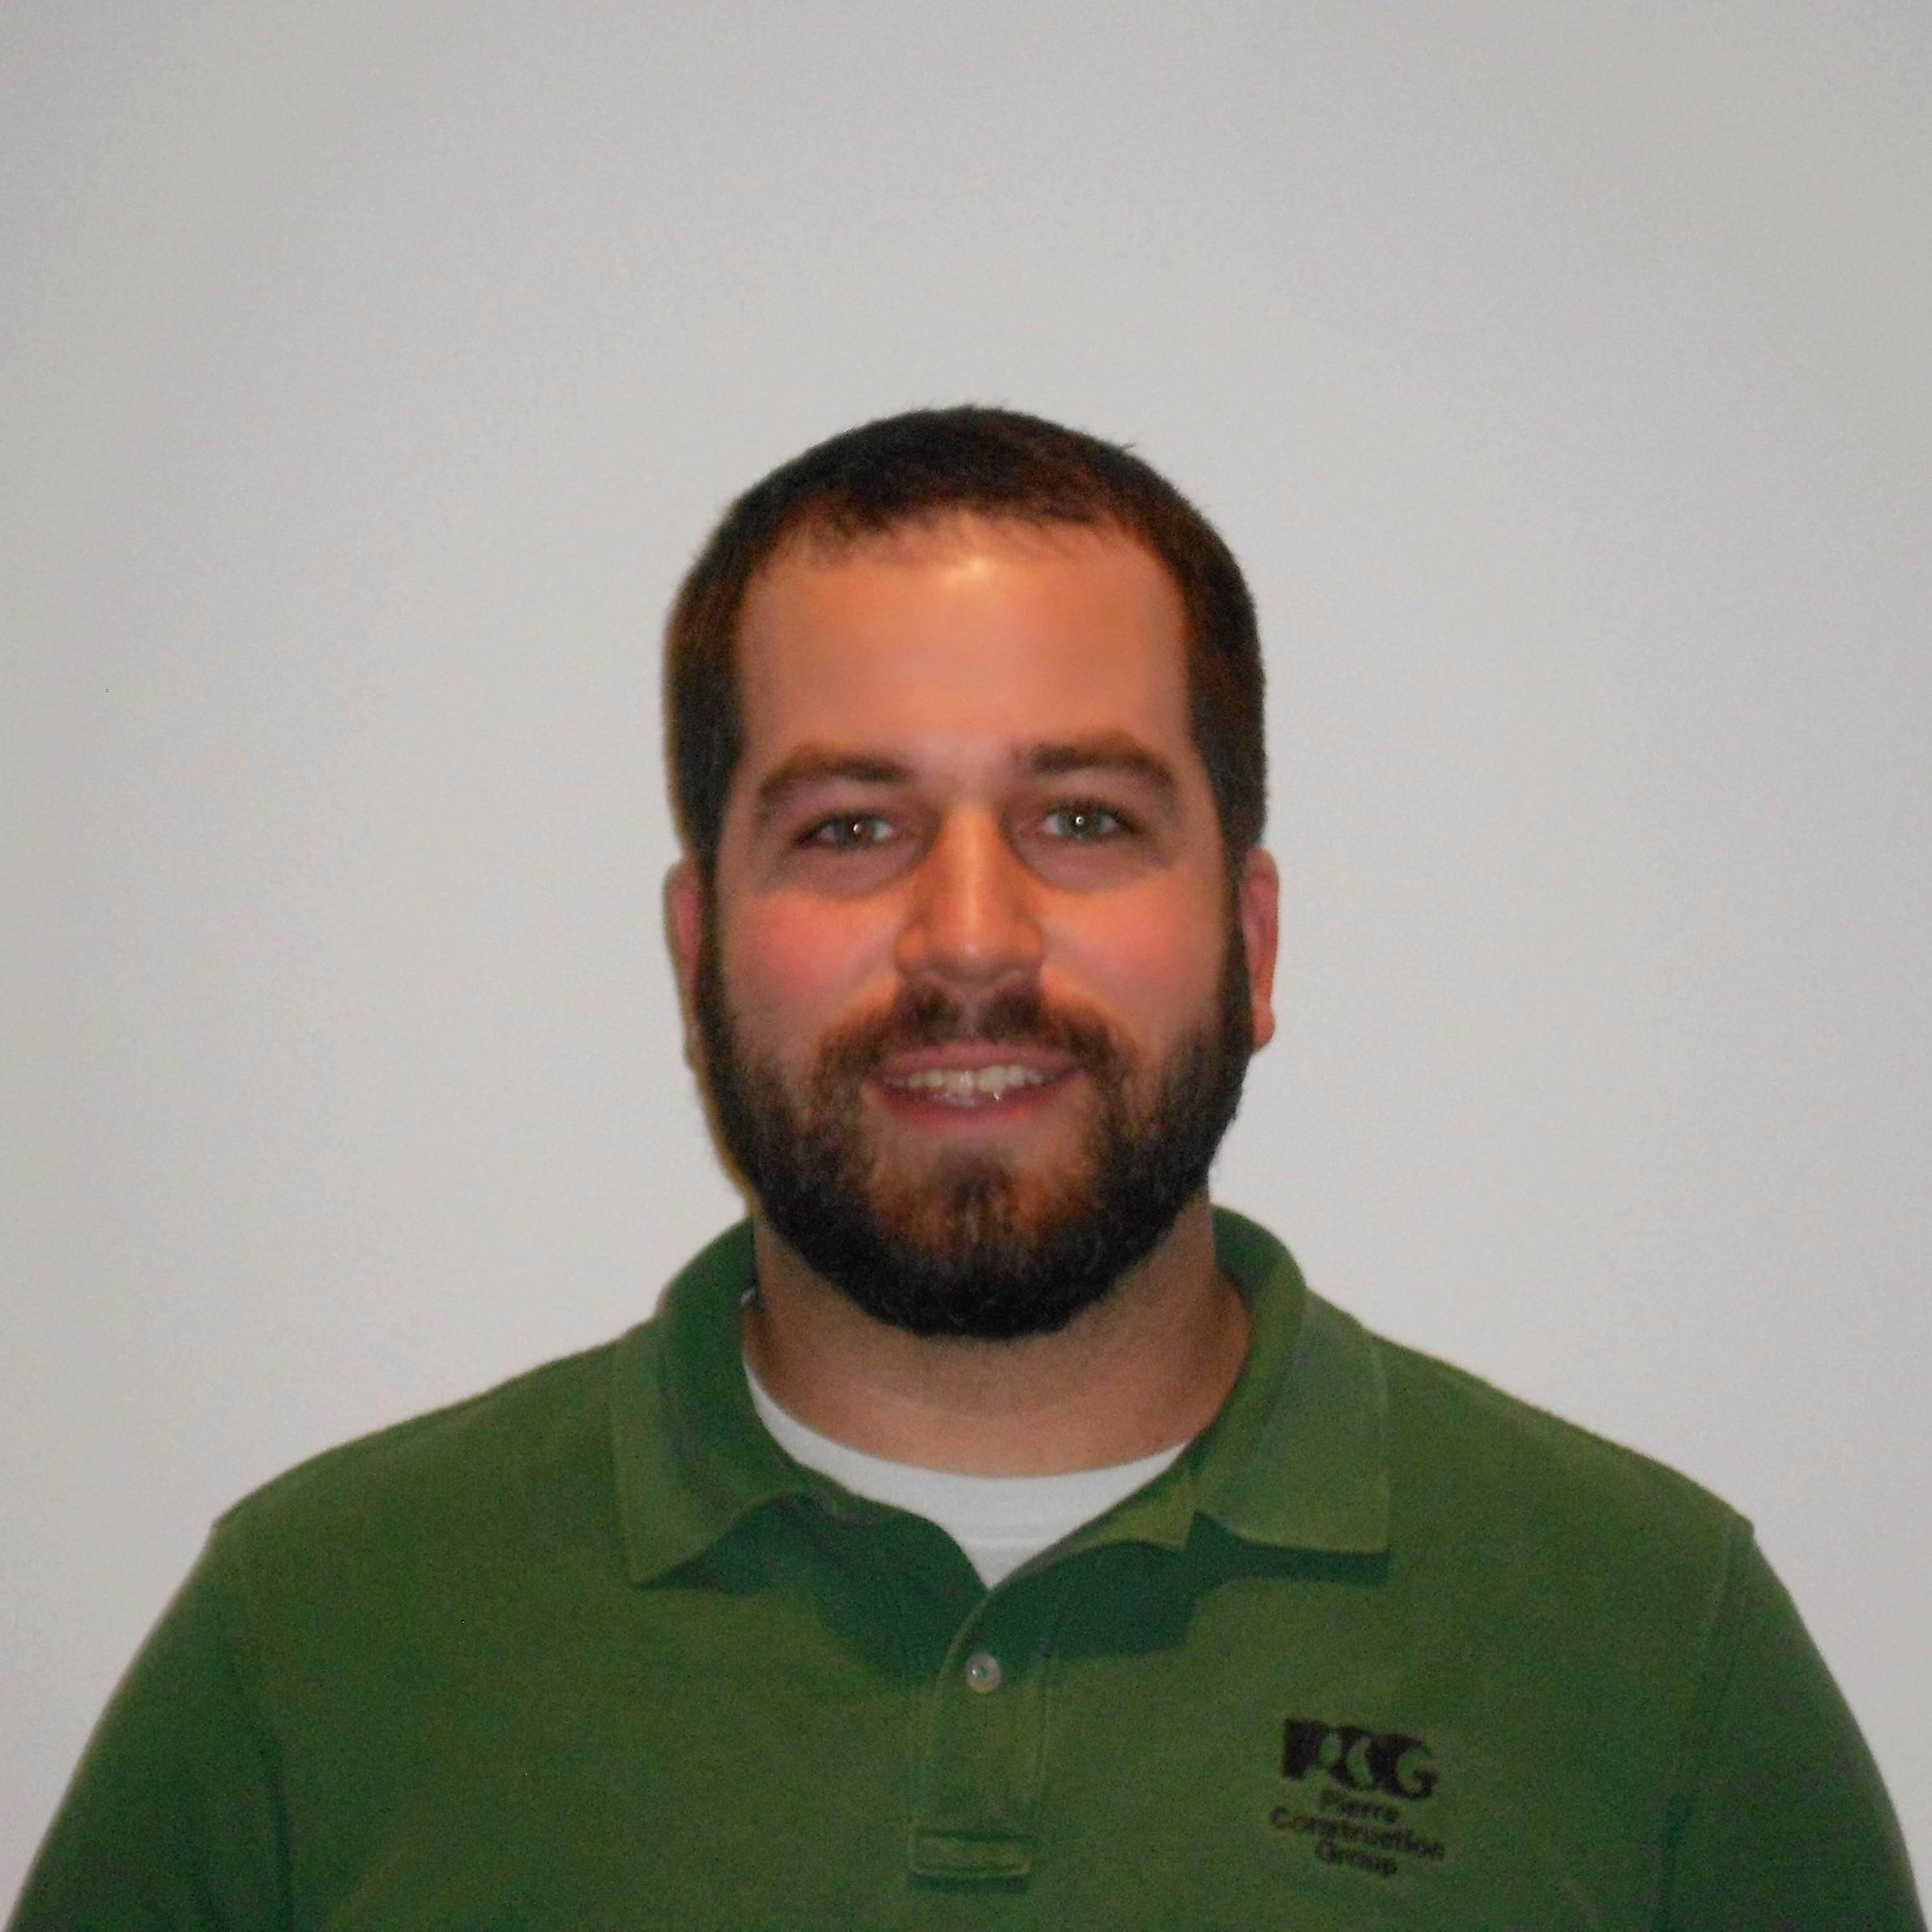 Meet Pcg Pierre Construction